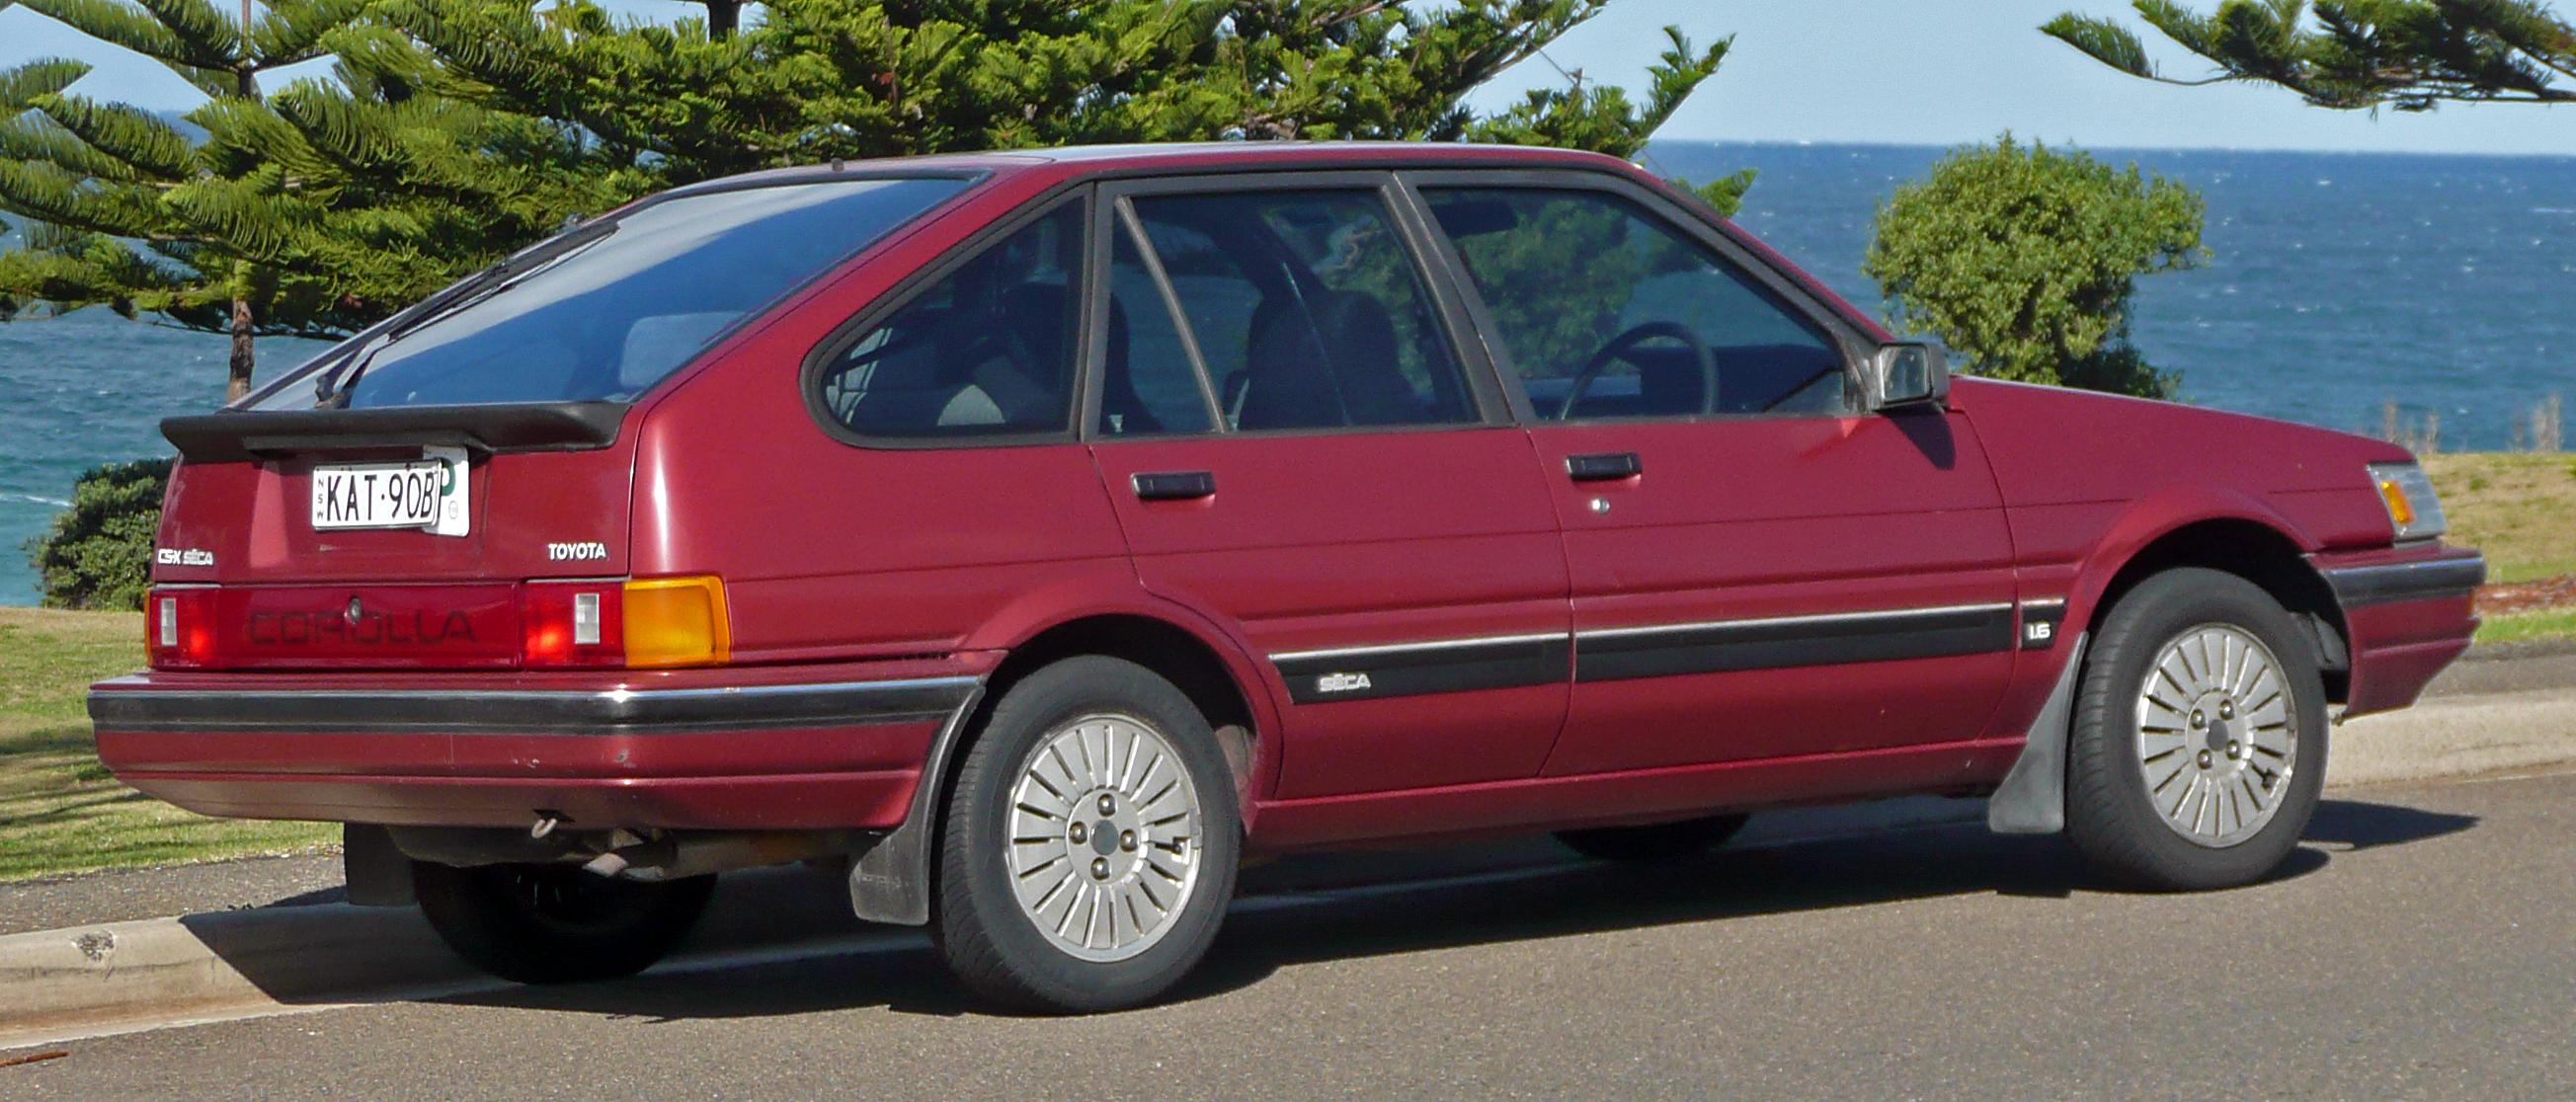 file 1986 1989 toyota corolla ae82 csx seca liftback 02 jpg rh commons wikimedia org 2014 Toyota Corolla 1995 Toyota Corolla